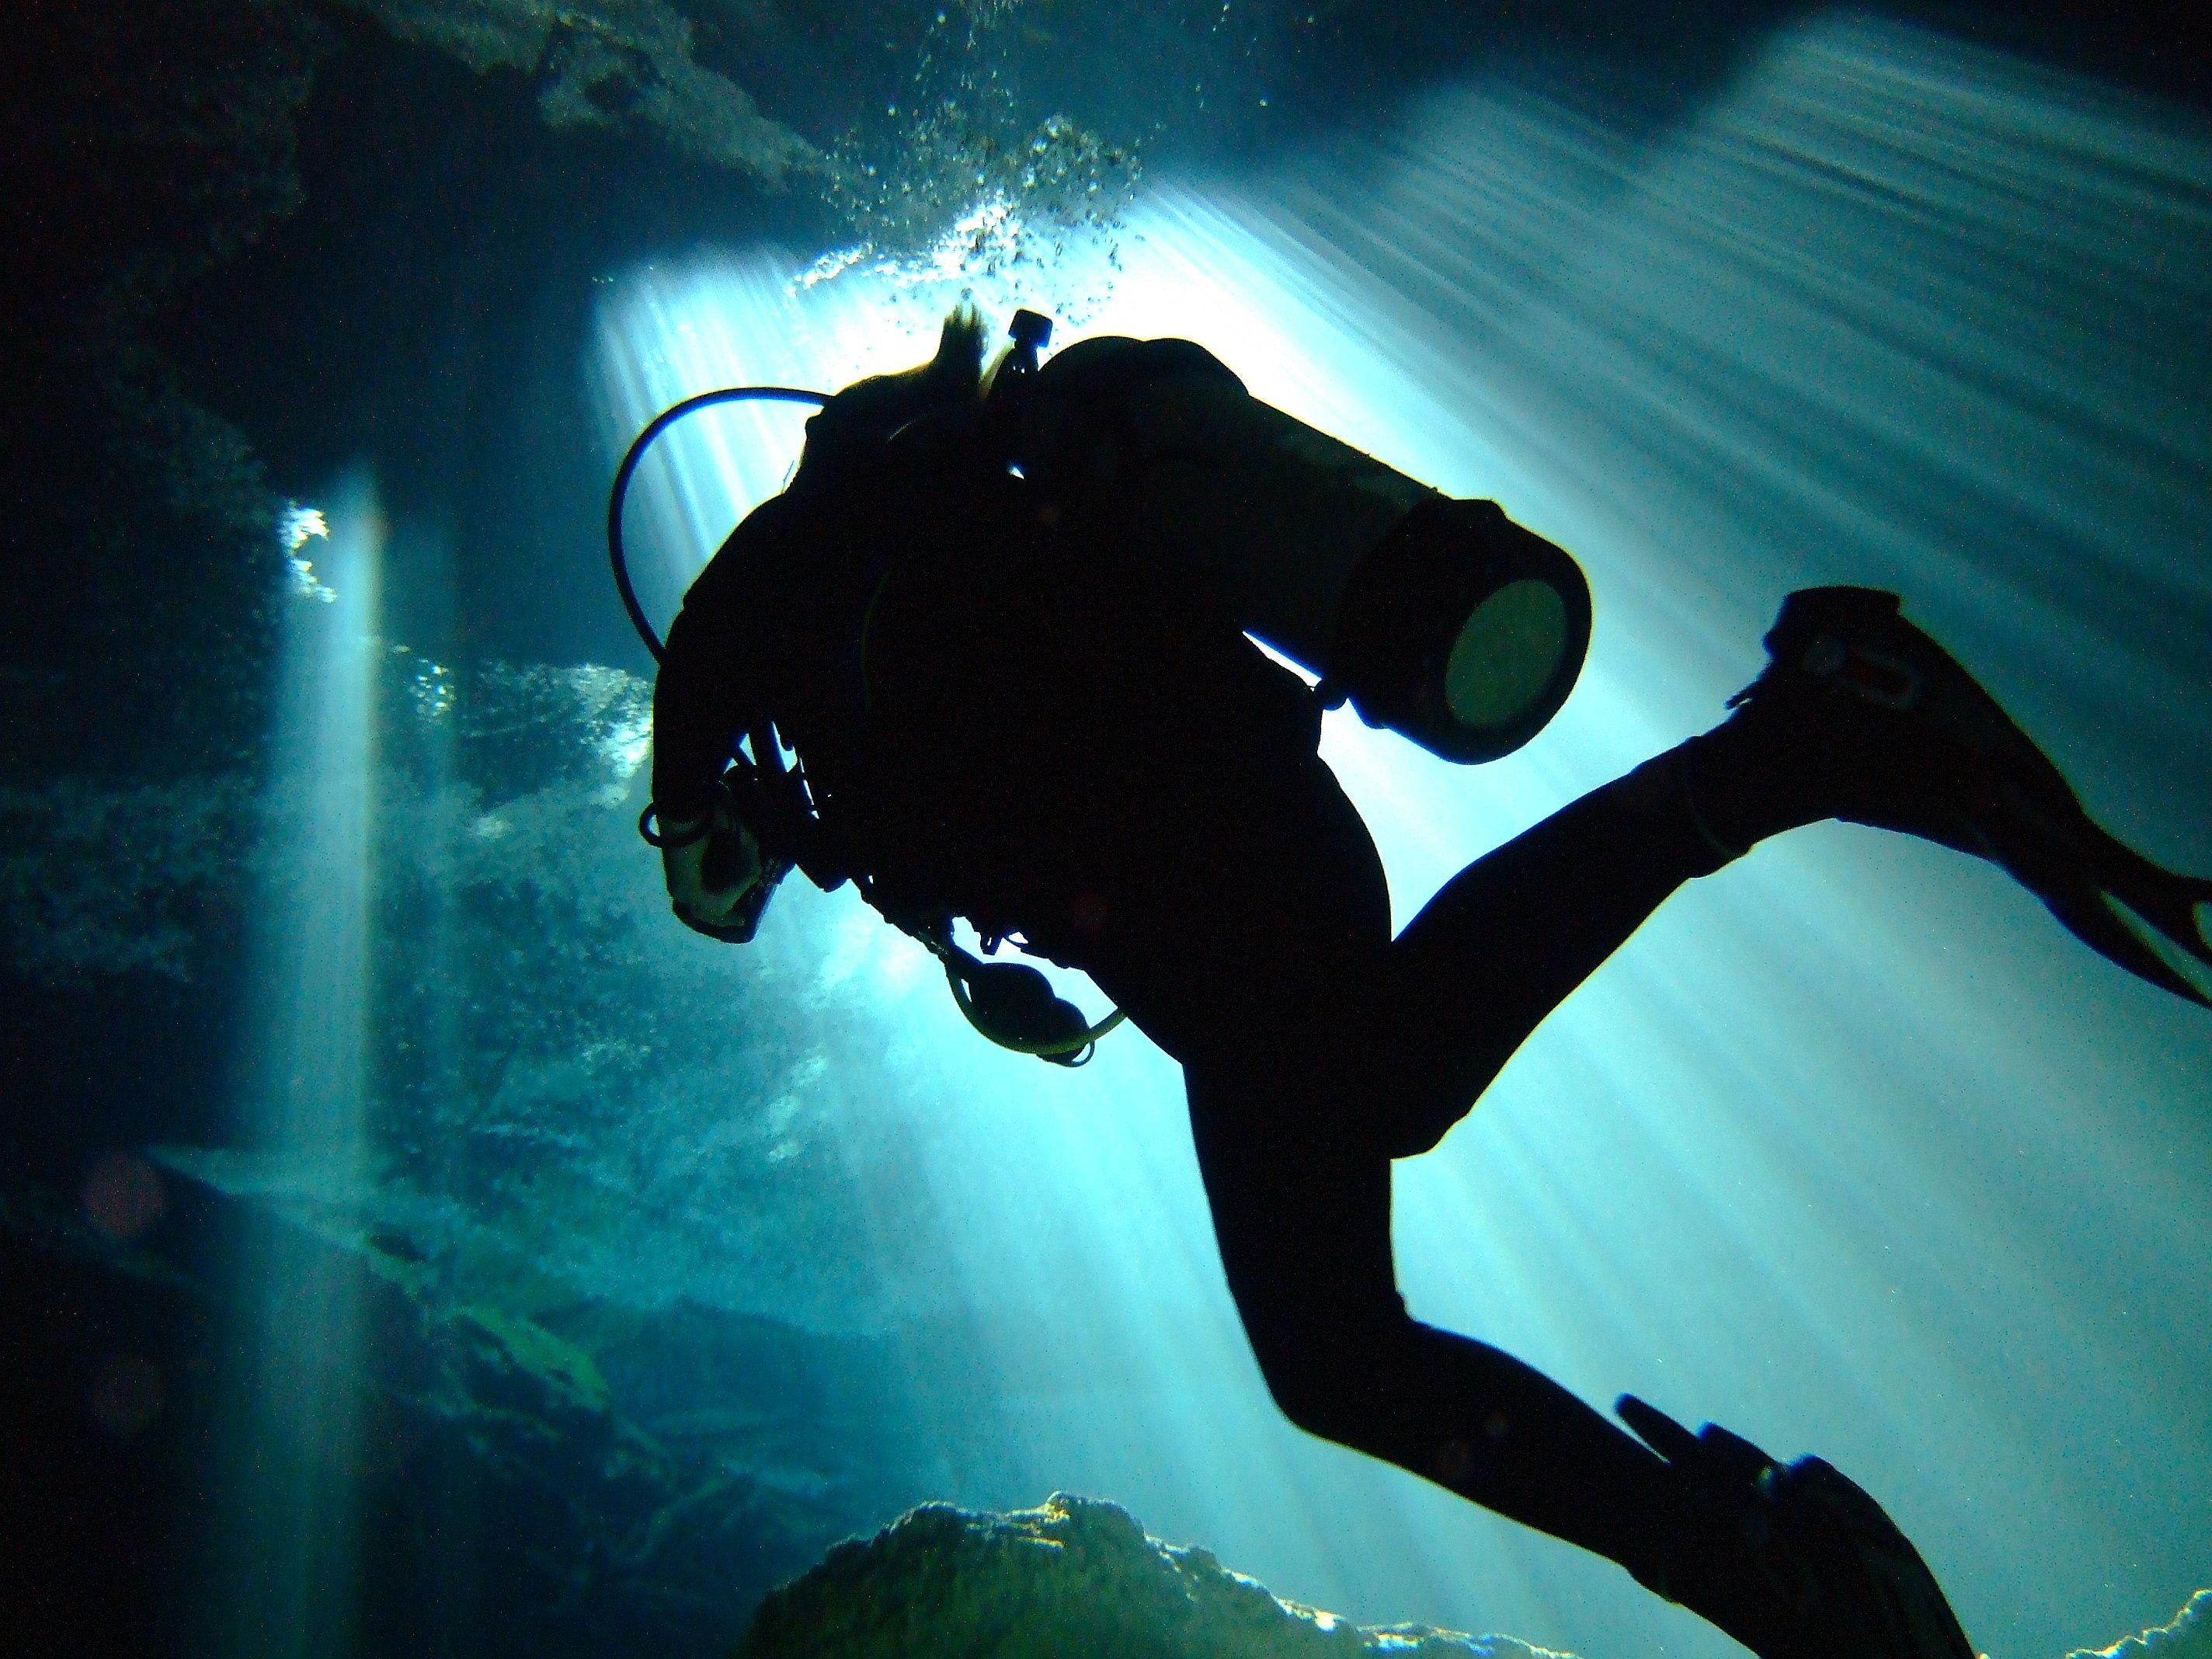 scuba diving wallpaper wallpapers - photo #25